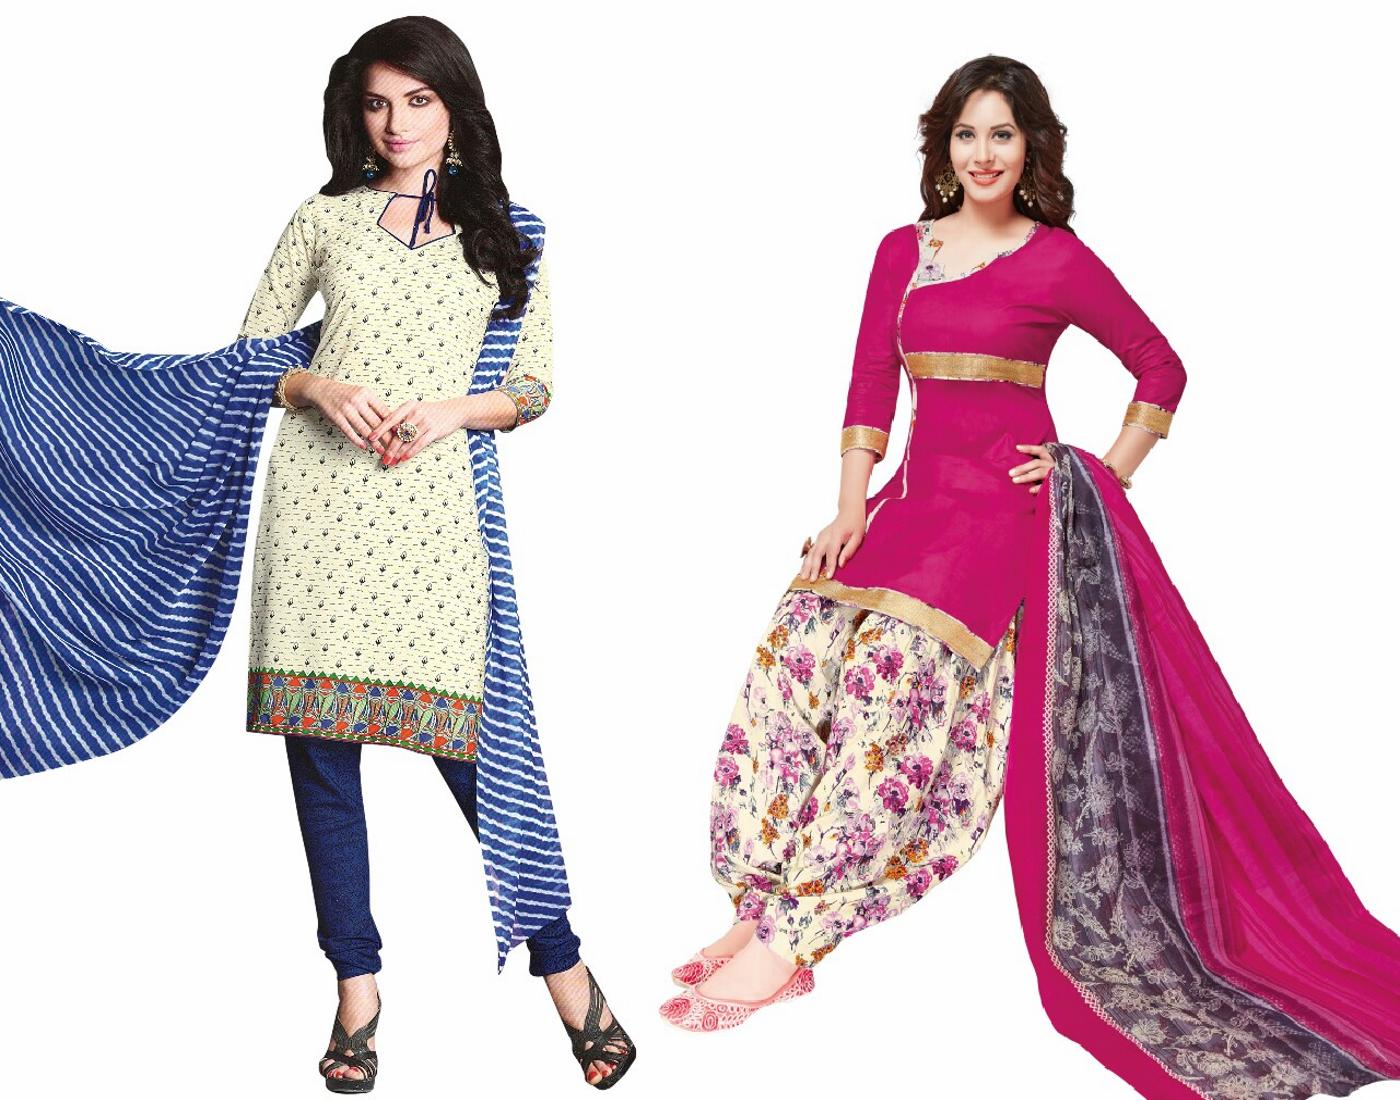 Buy Diwali Combo Offer Online From Designers Across India Kemeja Lavender Contrast Multicolor Shop At Velvet